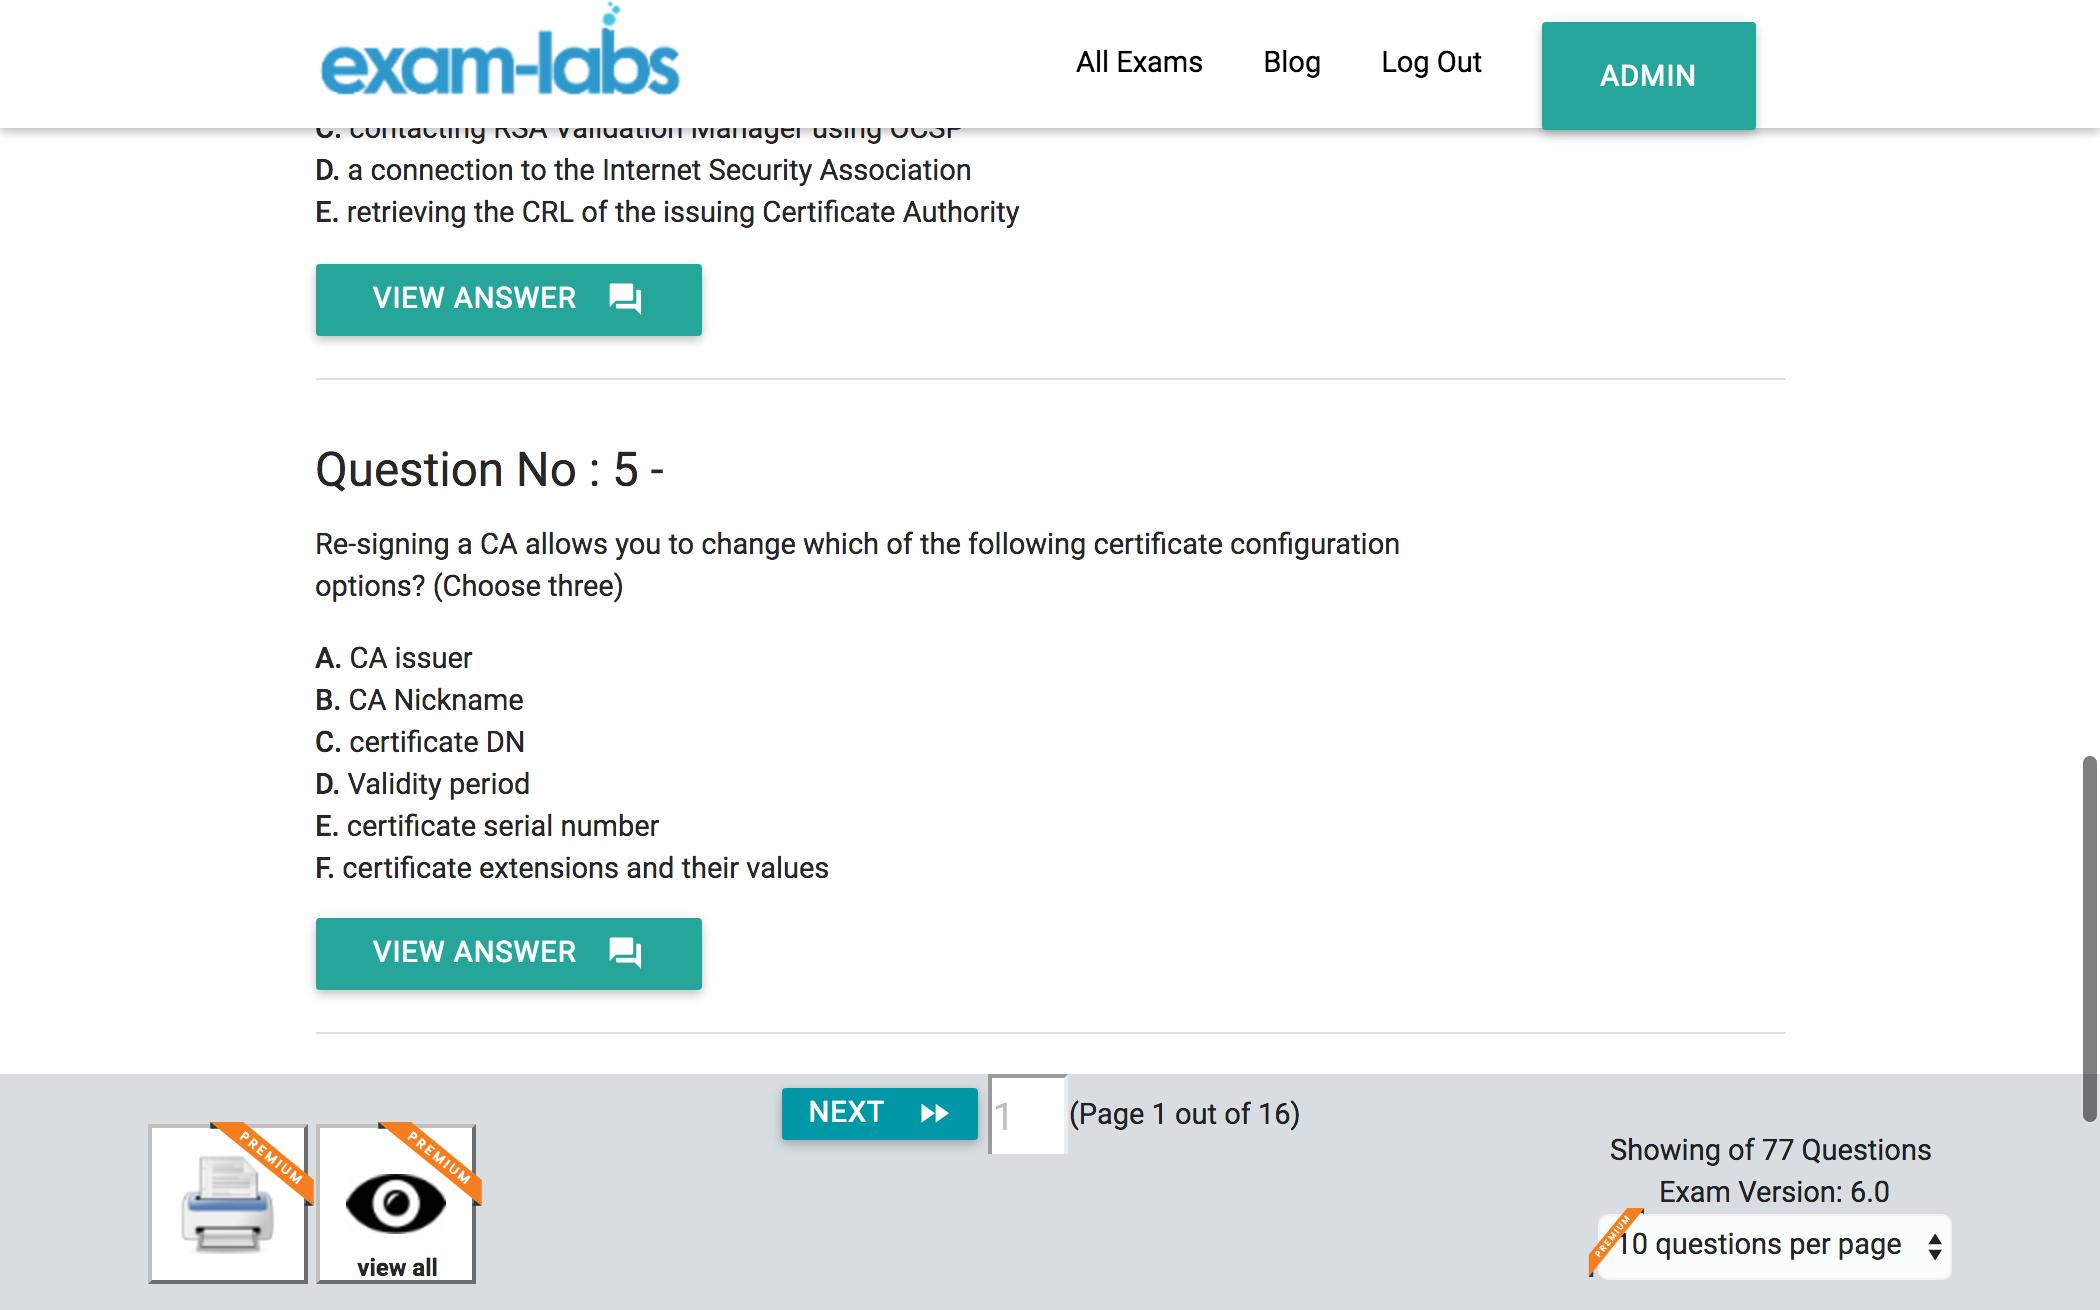 050 v66 sercms02 rsa real exam questions 100 free exam labs rsa 050 v66 sercms02 rsa certificate management solution 66 cse exam exam xflitez Image collections